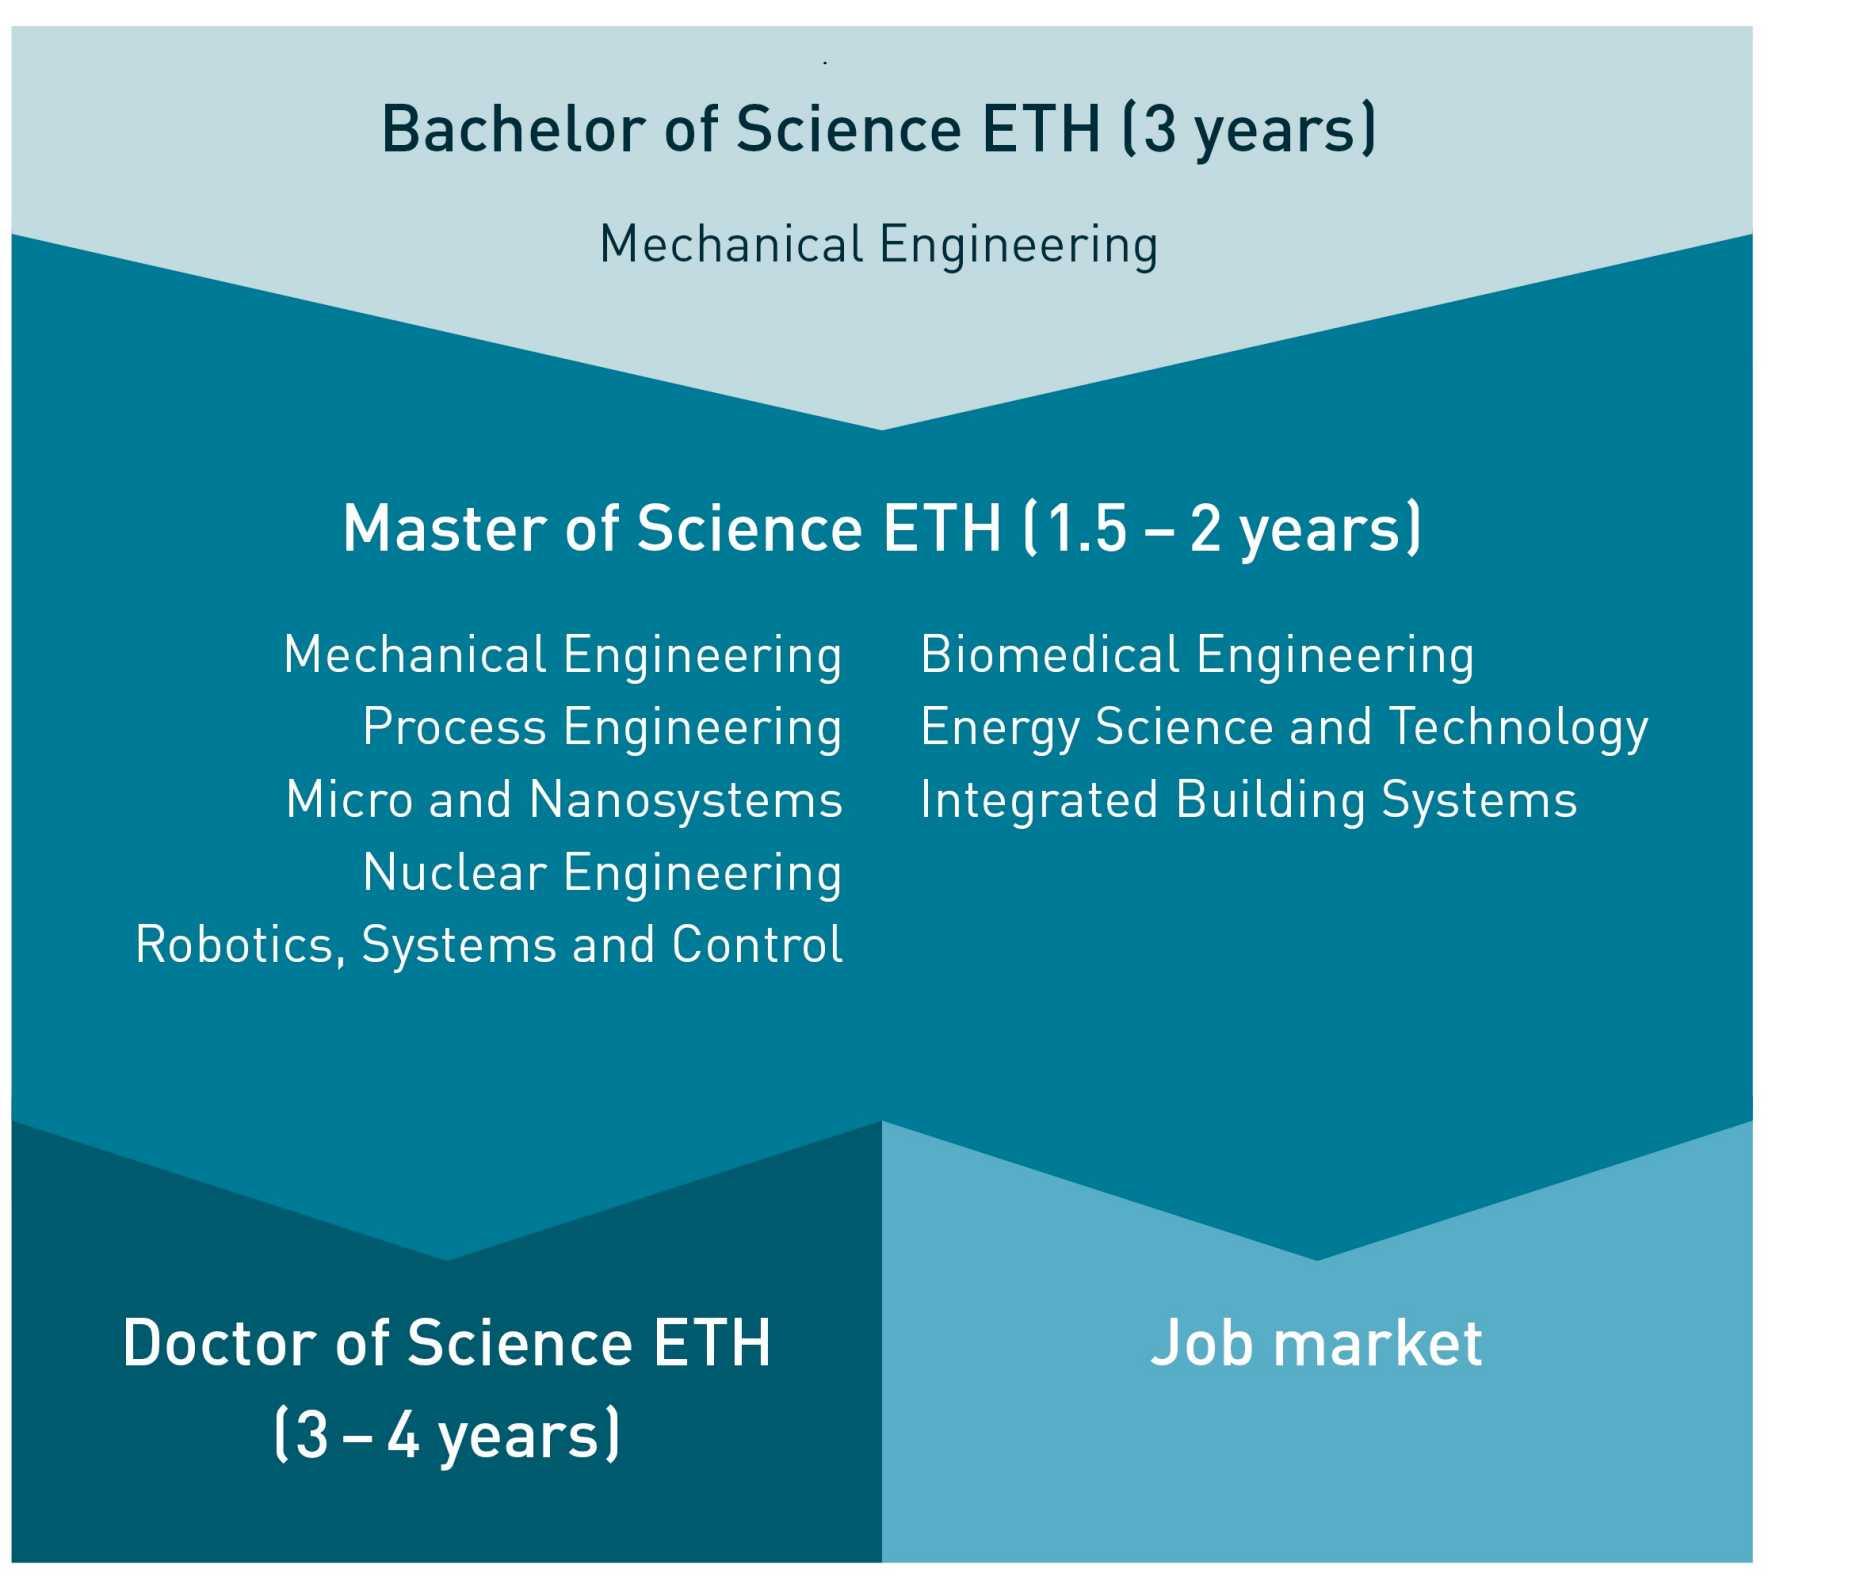 bachelor thesis mavt ethz